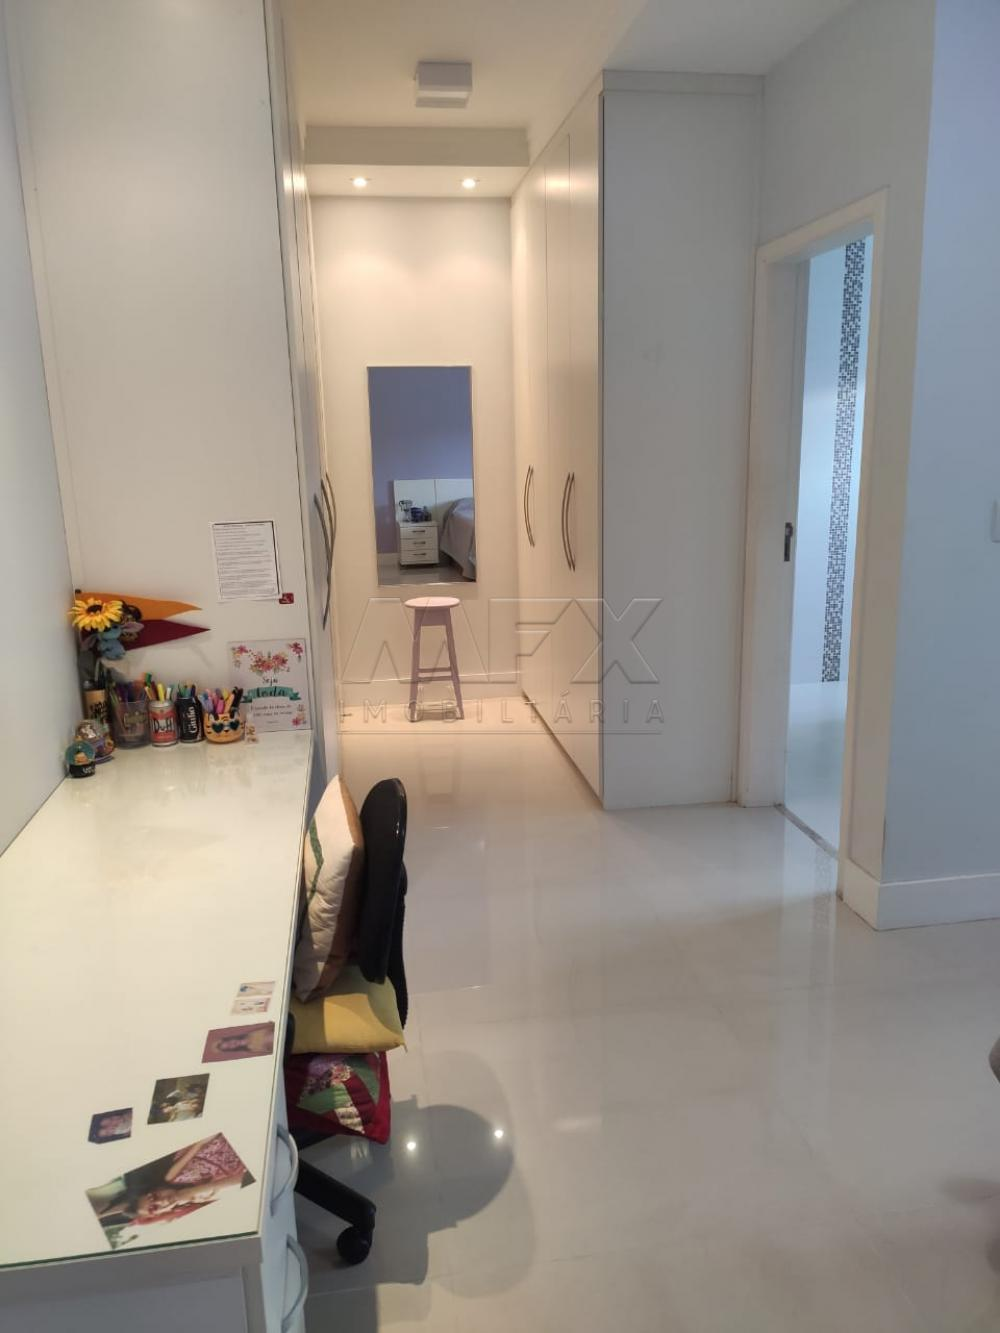 Comprar Casa / Condomínio em Bauru apenas R$ 1.800.000,00 - Foto 24